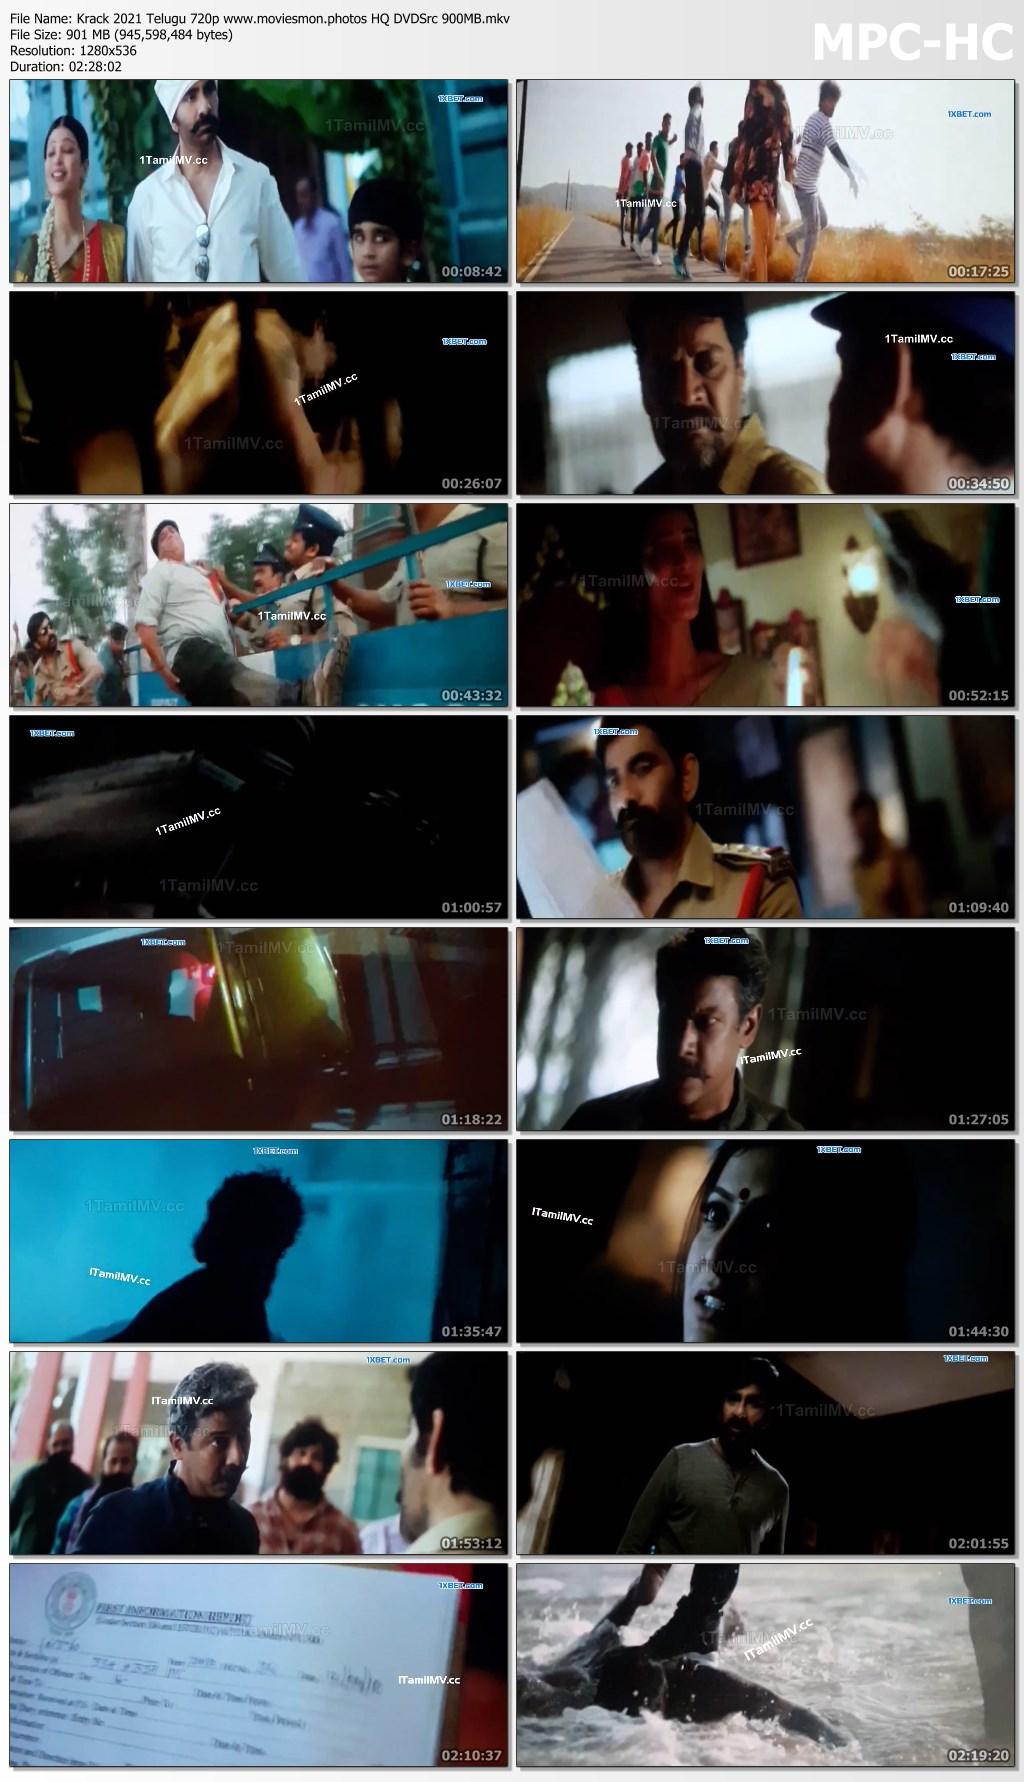 Krack 2021 Telugu Full Movie 720p HQ DVDSrc 950MB Download